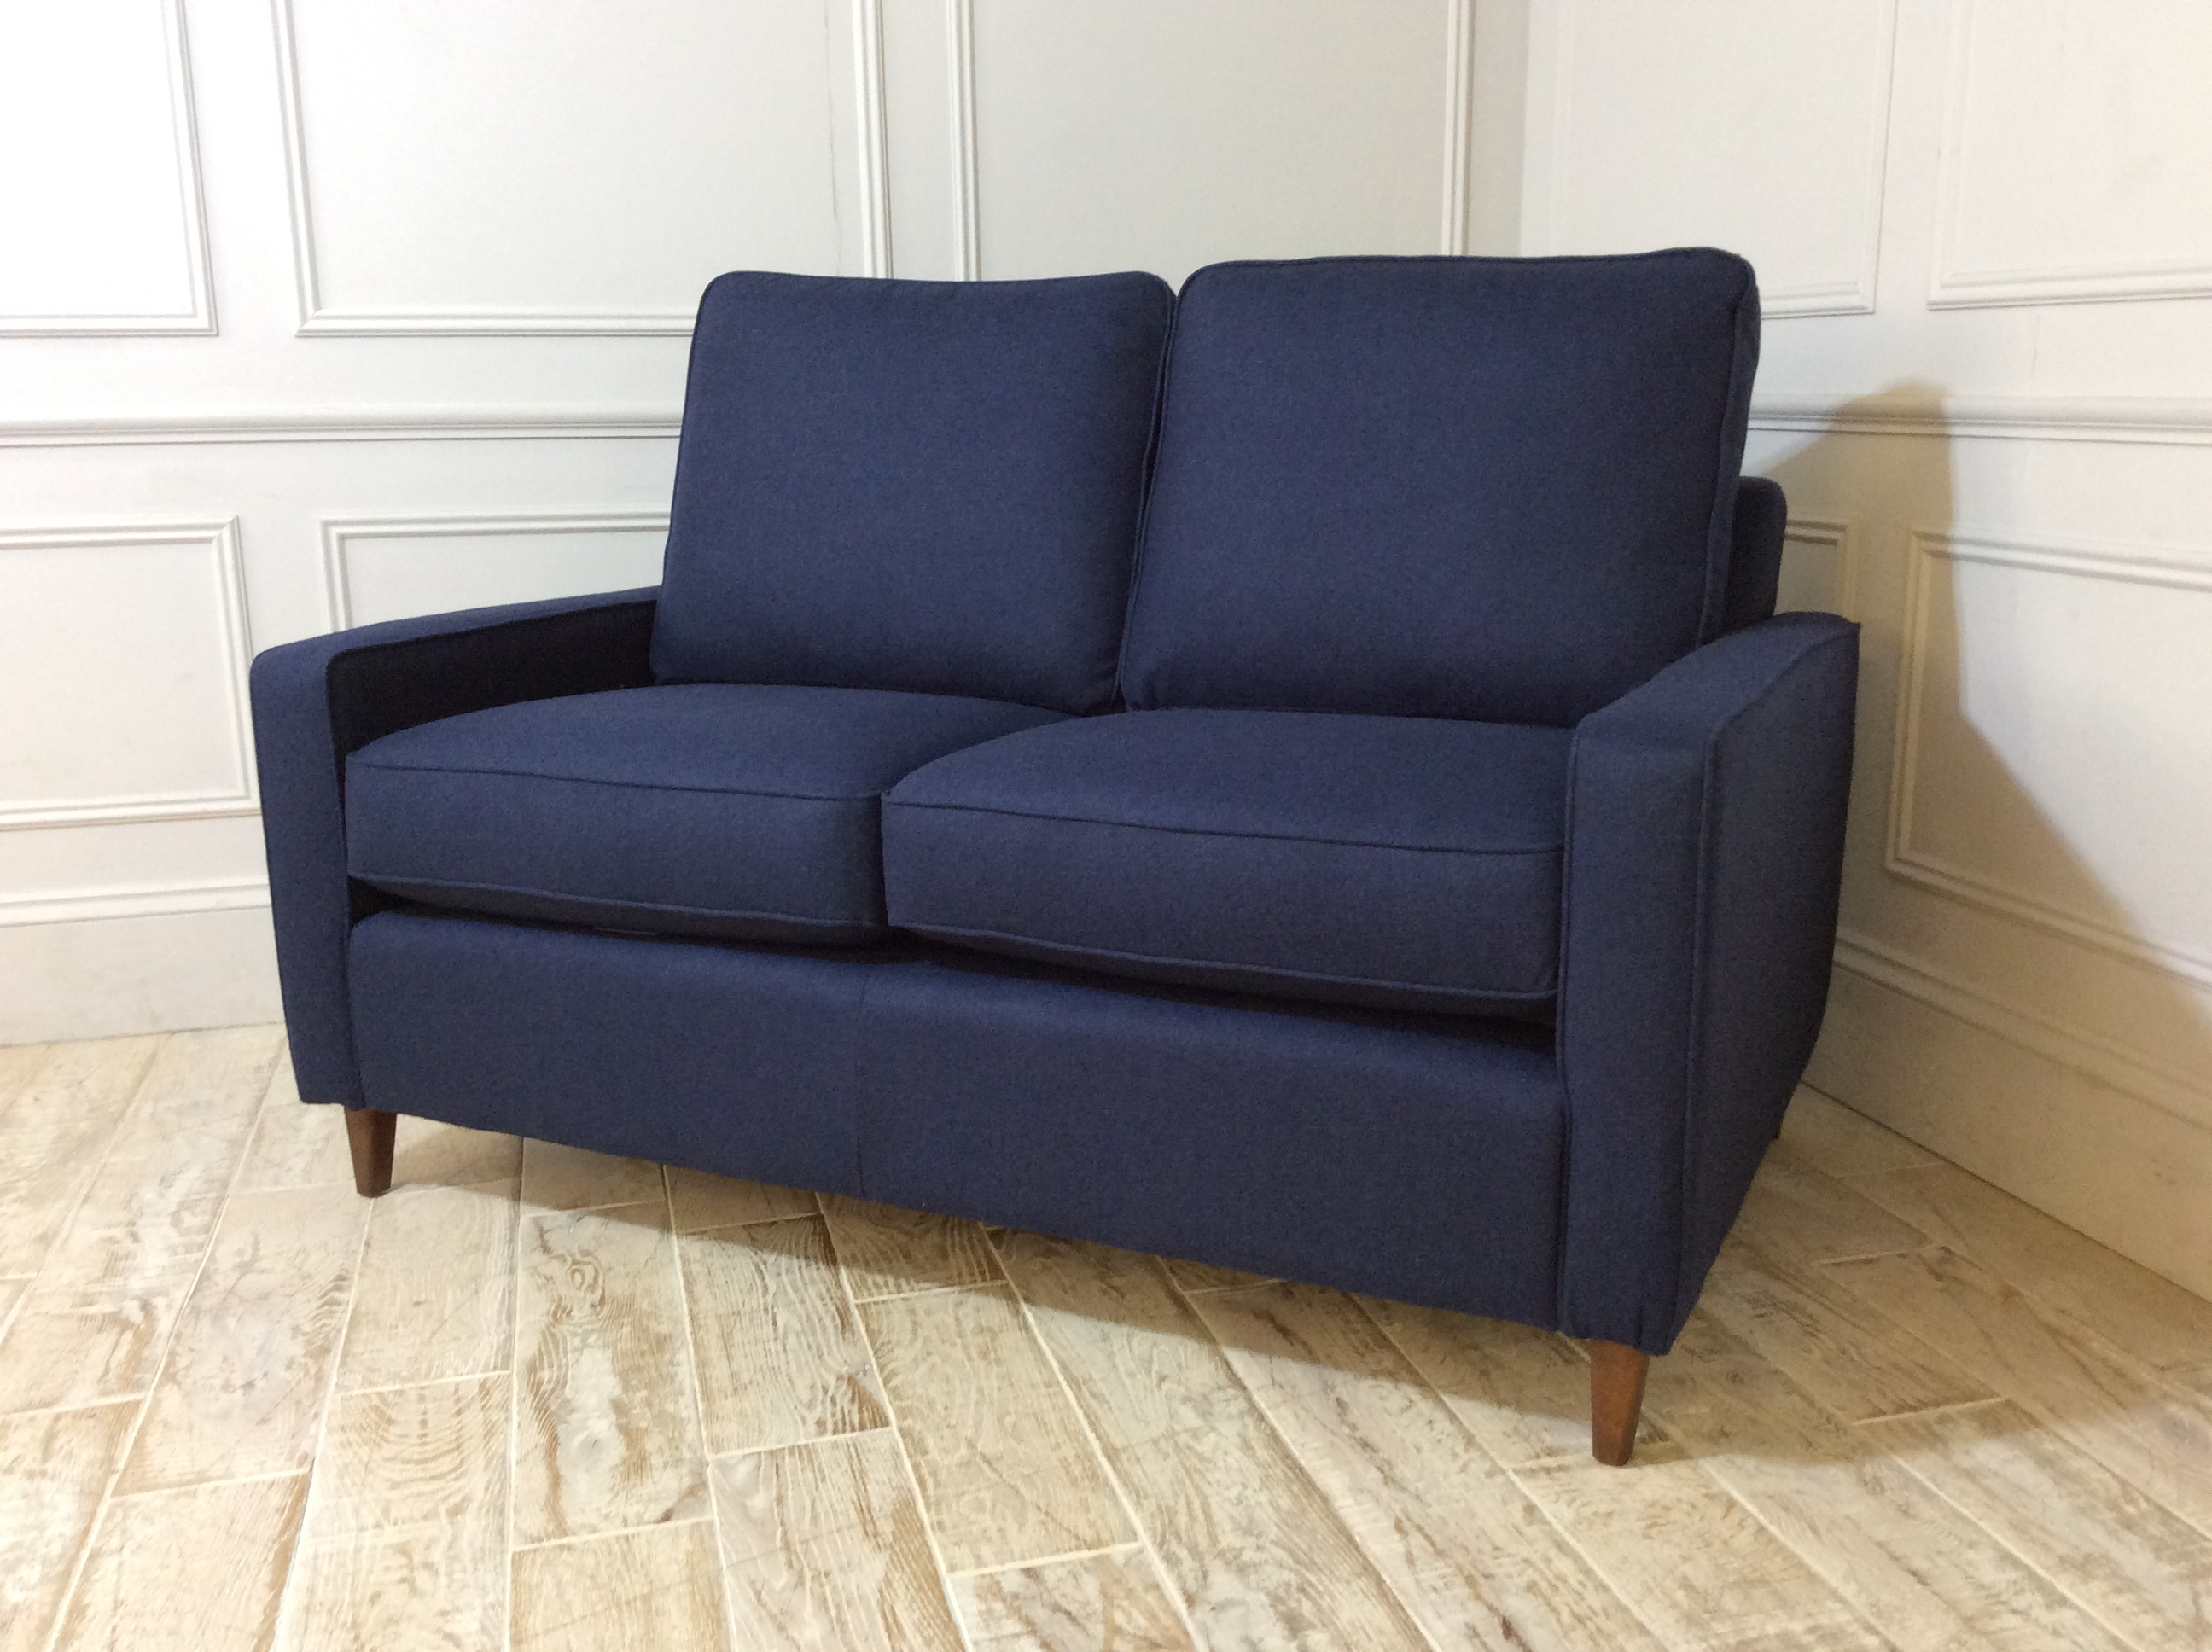 Beckenham 2 Seater Sofa in Wool Ink